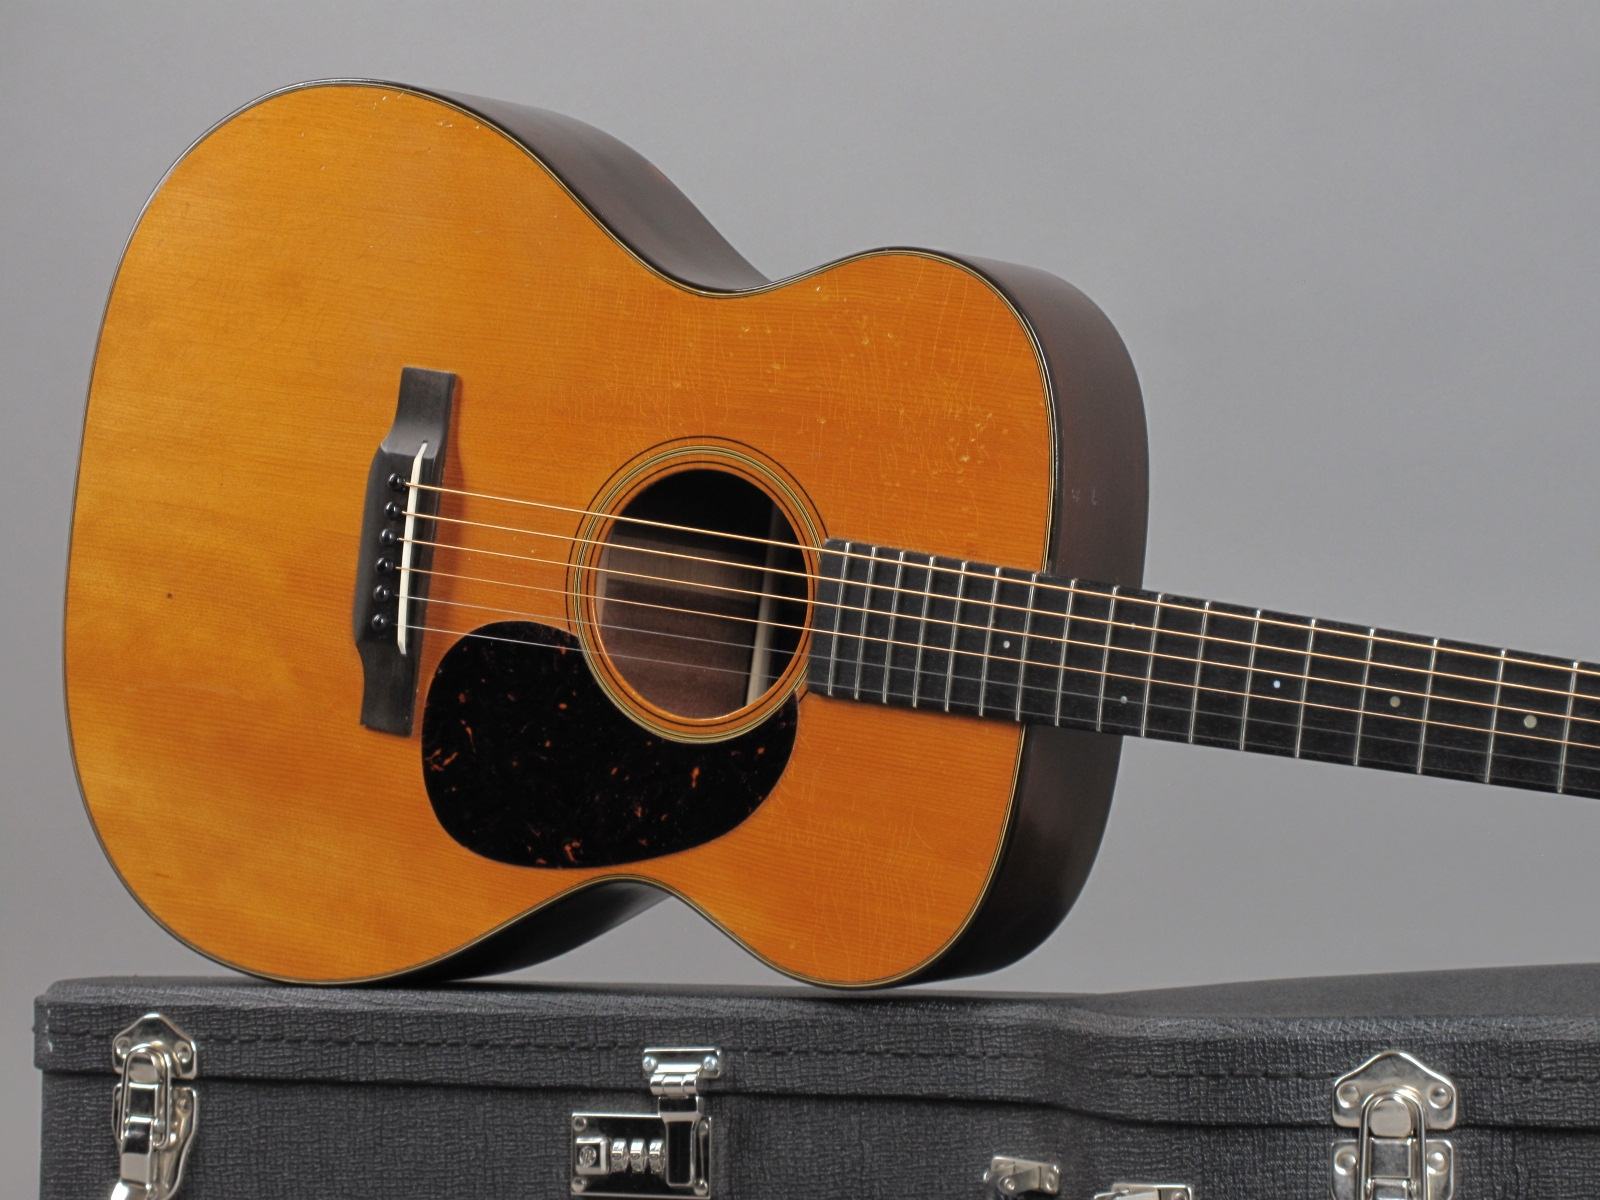 https://guitarpoint.de/app/uploads/products/1934-martin-000-18-natural/1934-Martin-000-18-Natural-57556_19.jpg